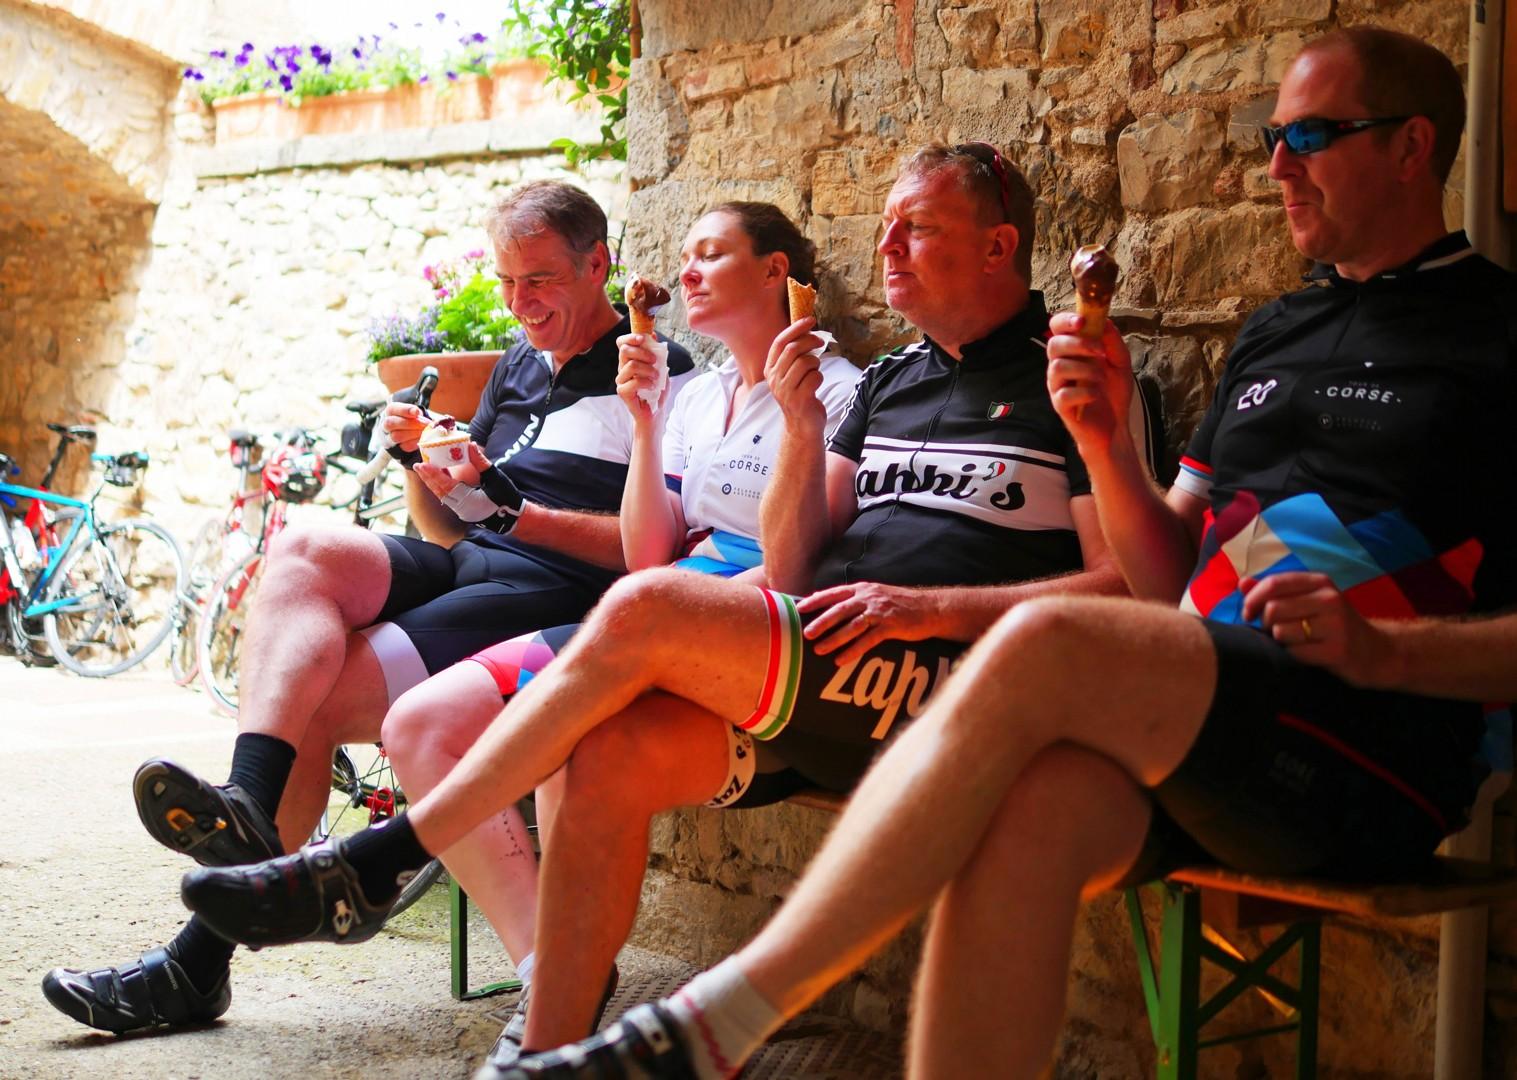 team-gelato-guided-italy-holiday.jpg - Italy - Tuscany Tourer - Guided Road Cycling Holiday - Italia Road Cycling